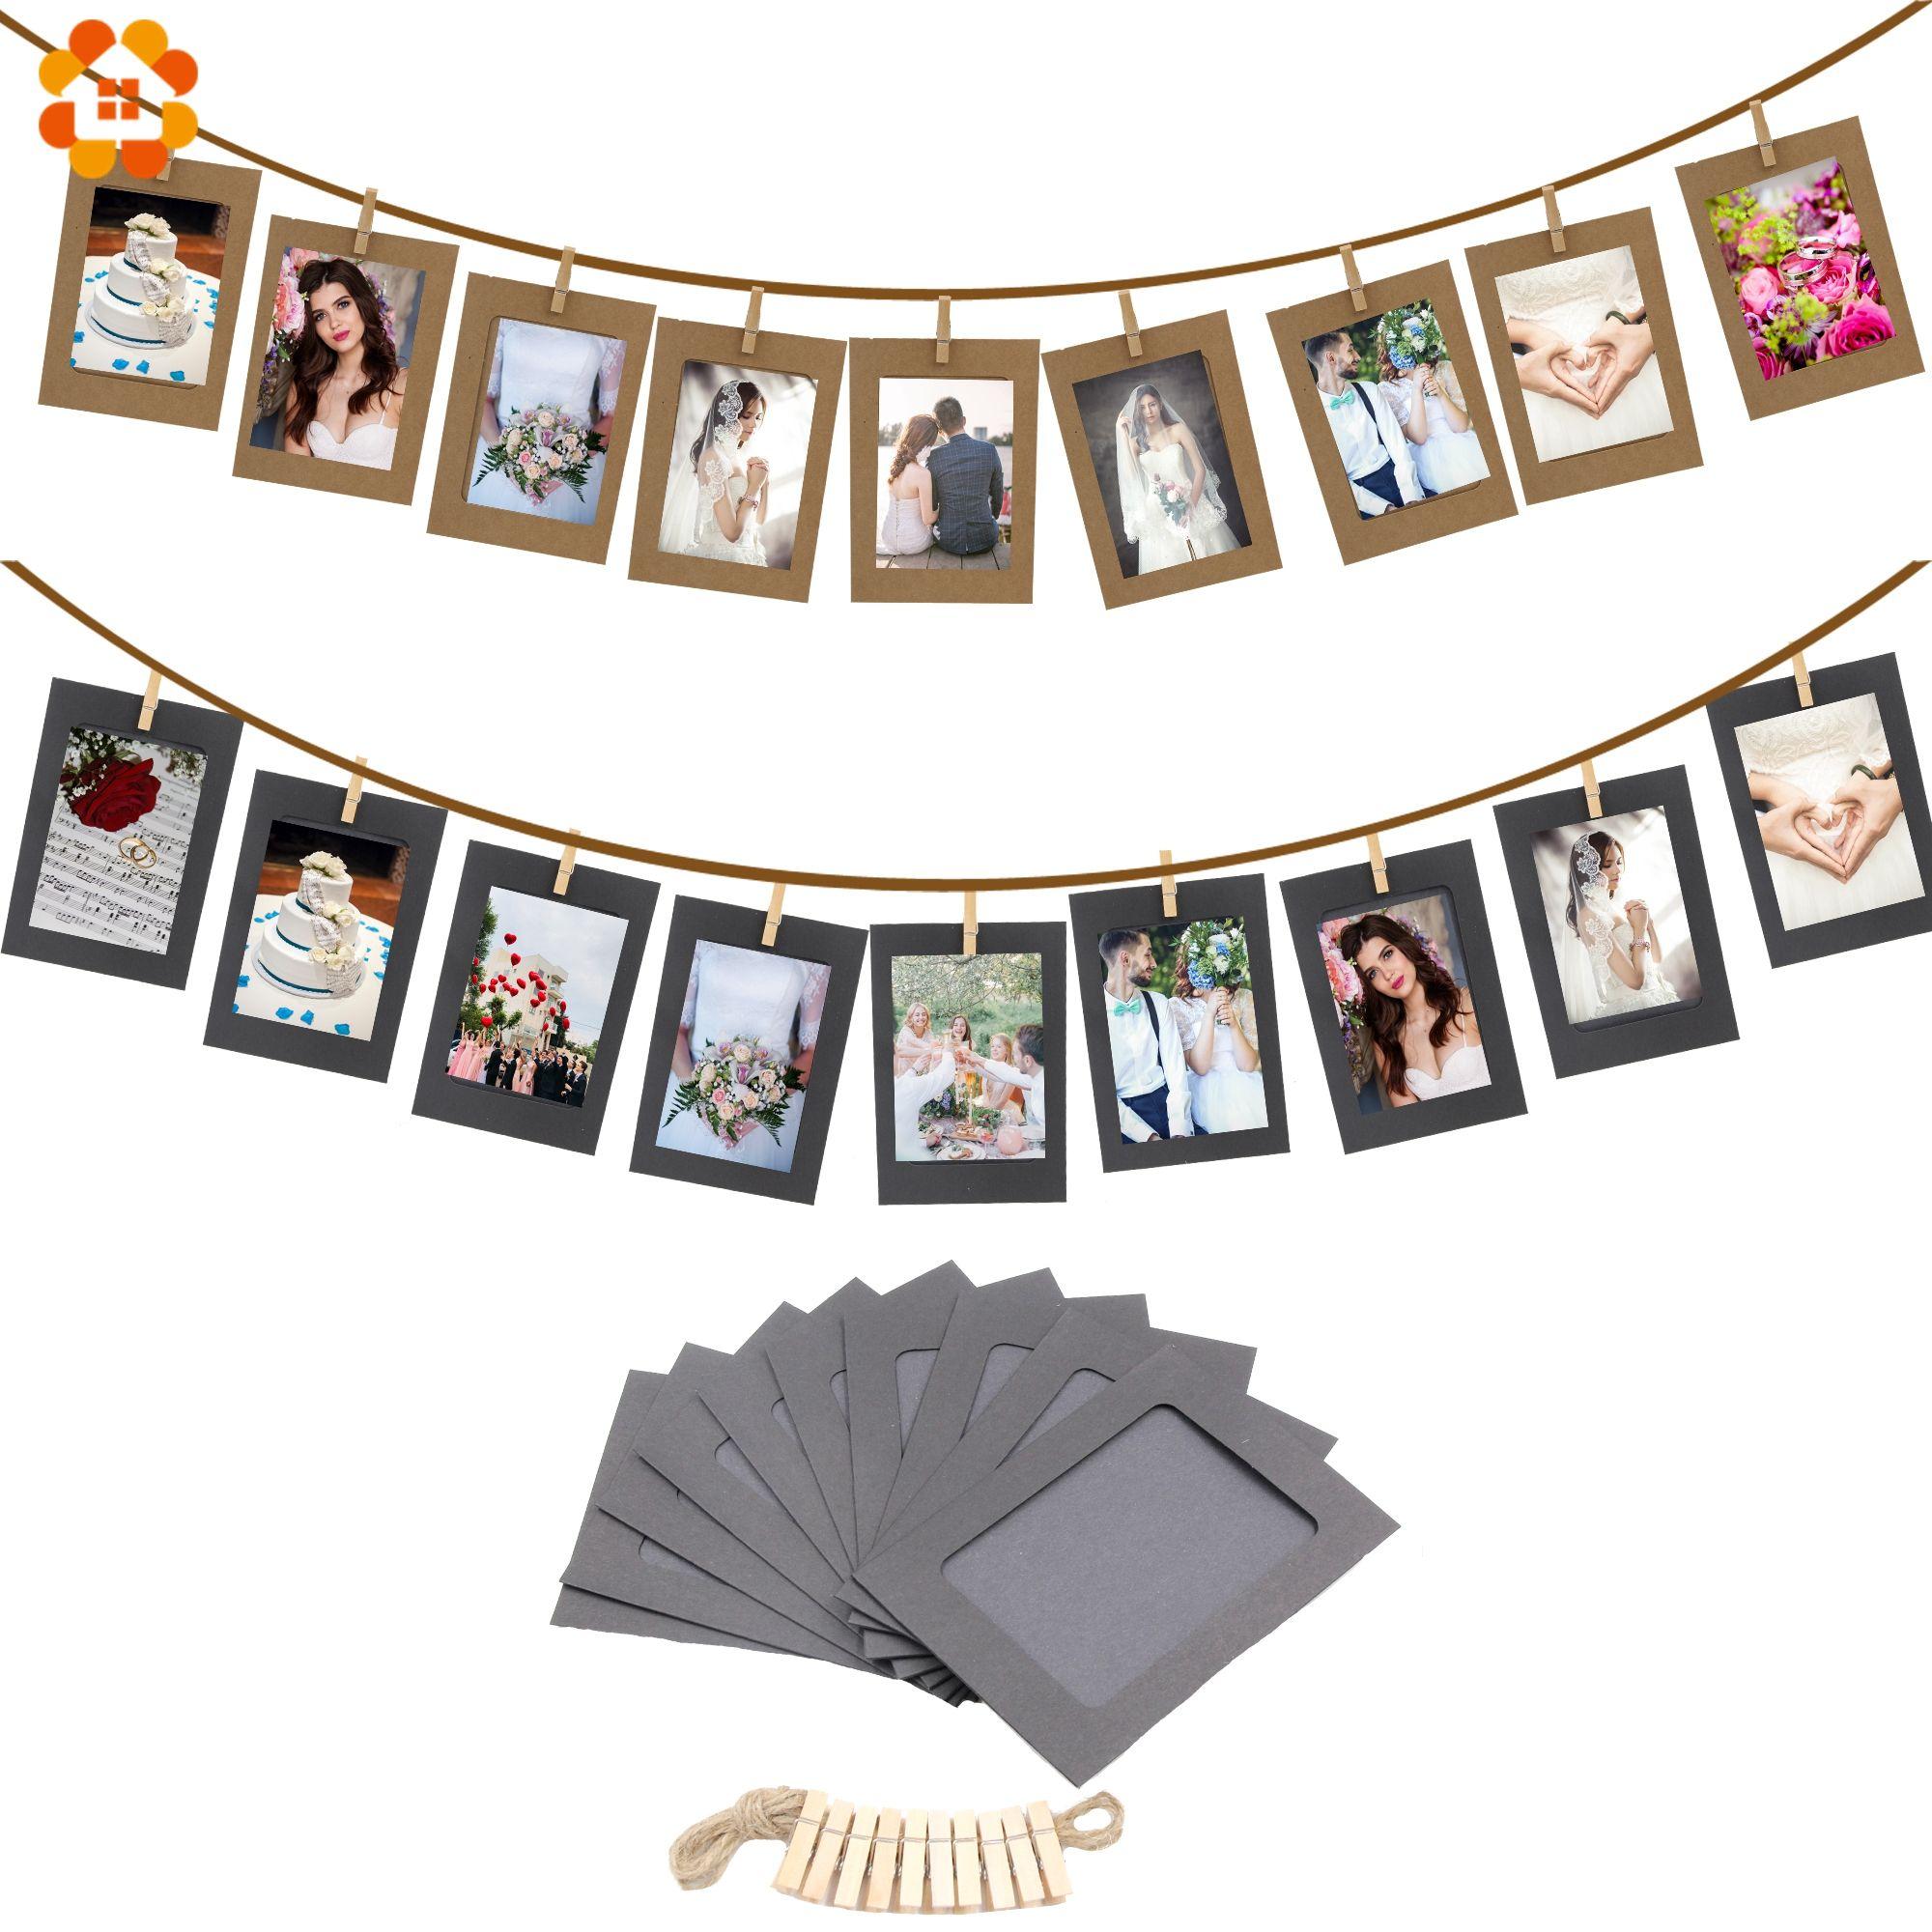 Buy 10PCS/Lot DIY Photo Frame Wooden Clip Paper Picture Holder For ...